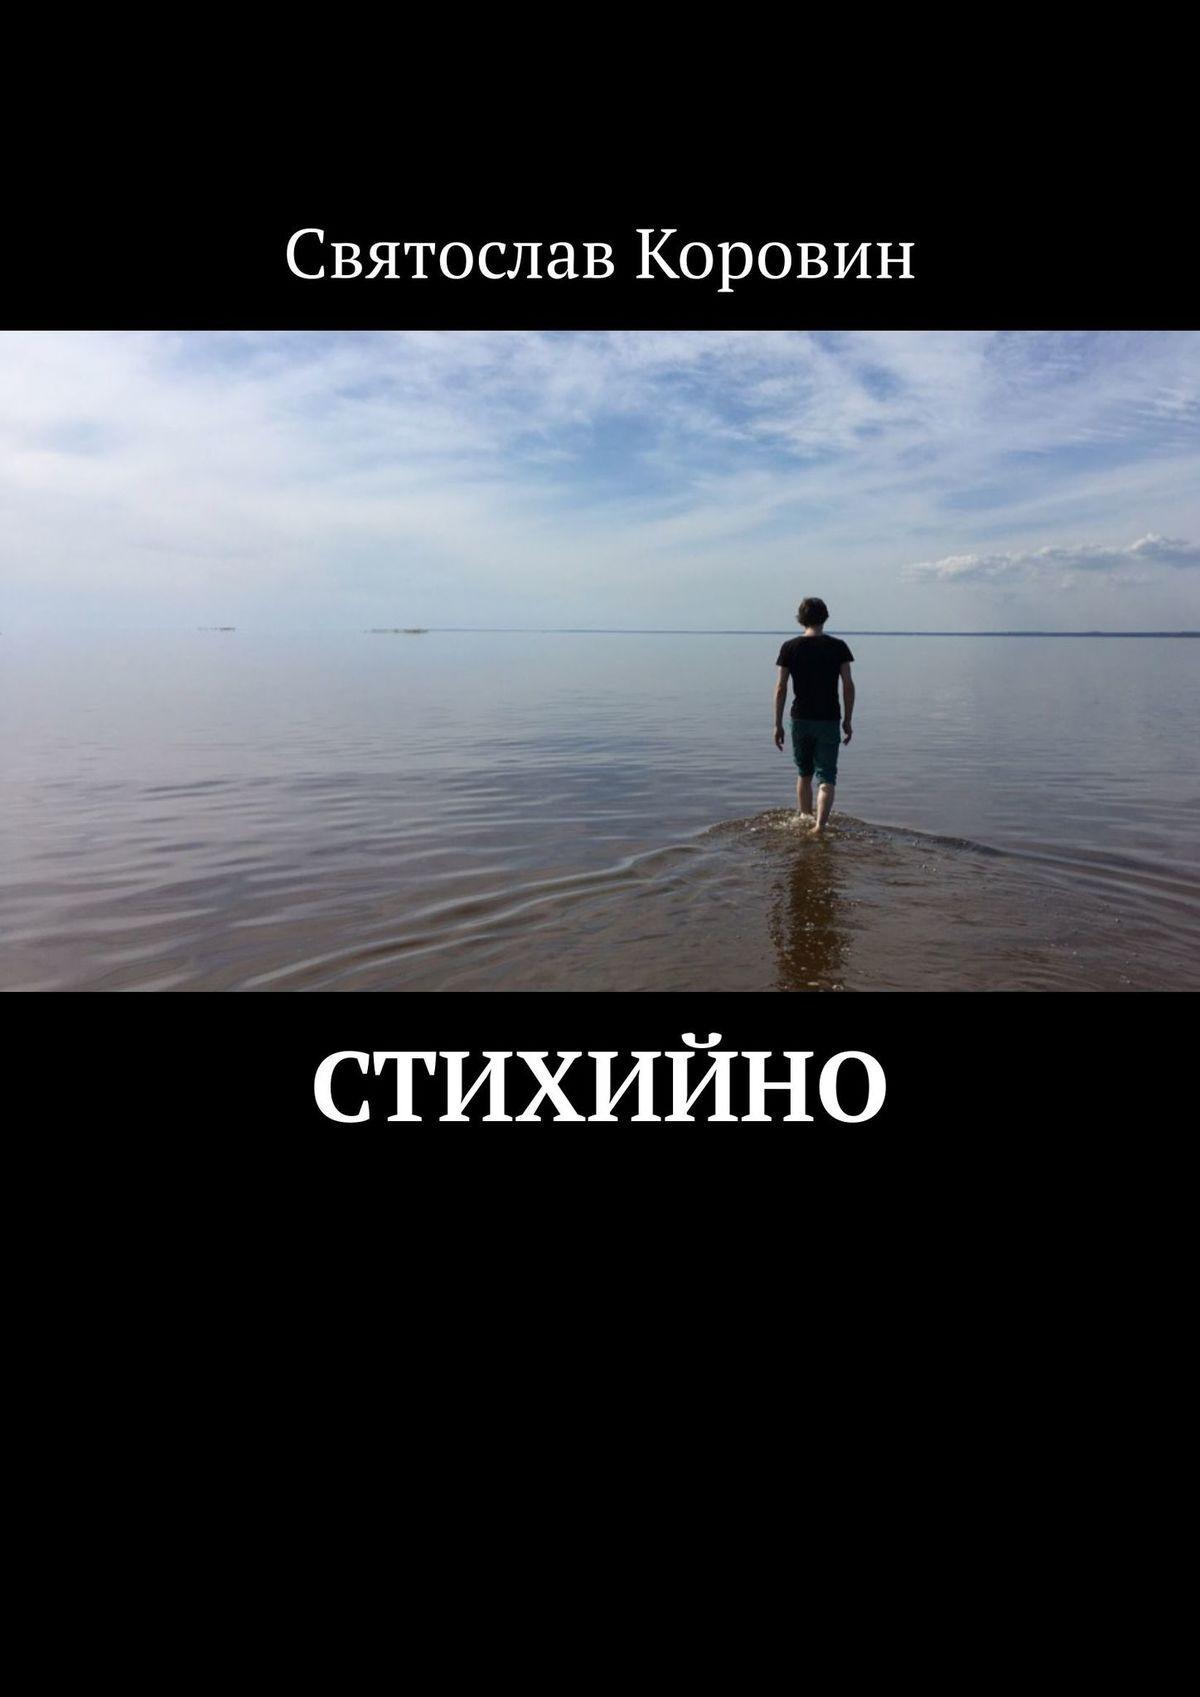 Святослав Коровин Стихийно баянов мия ли кирим кто курит тот поймет 2